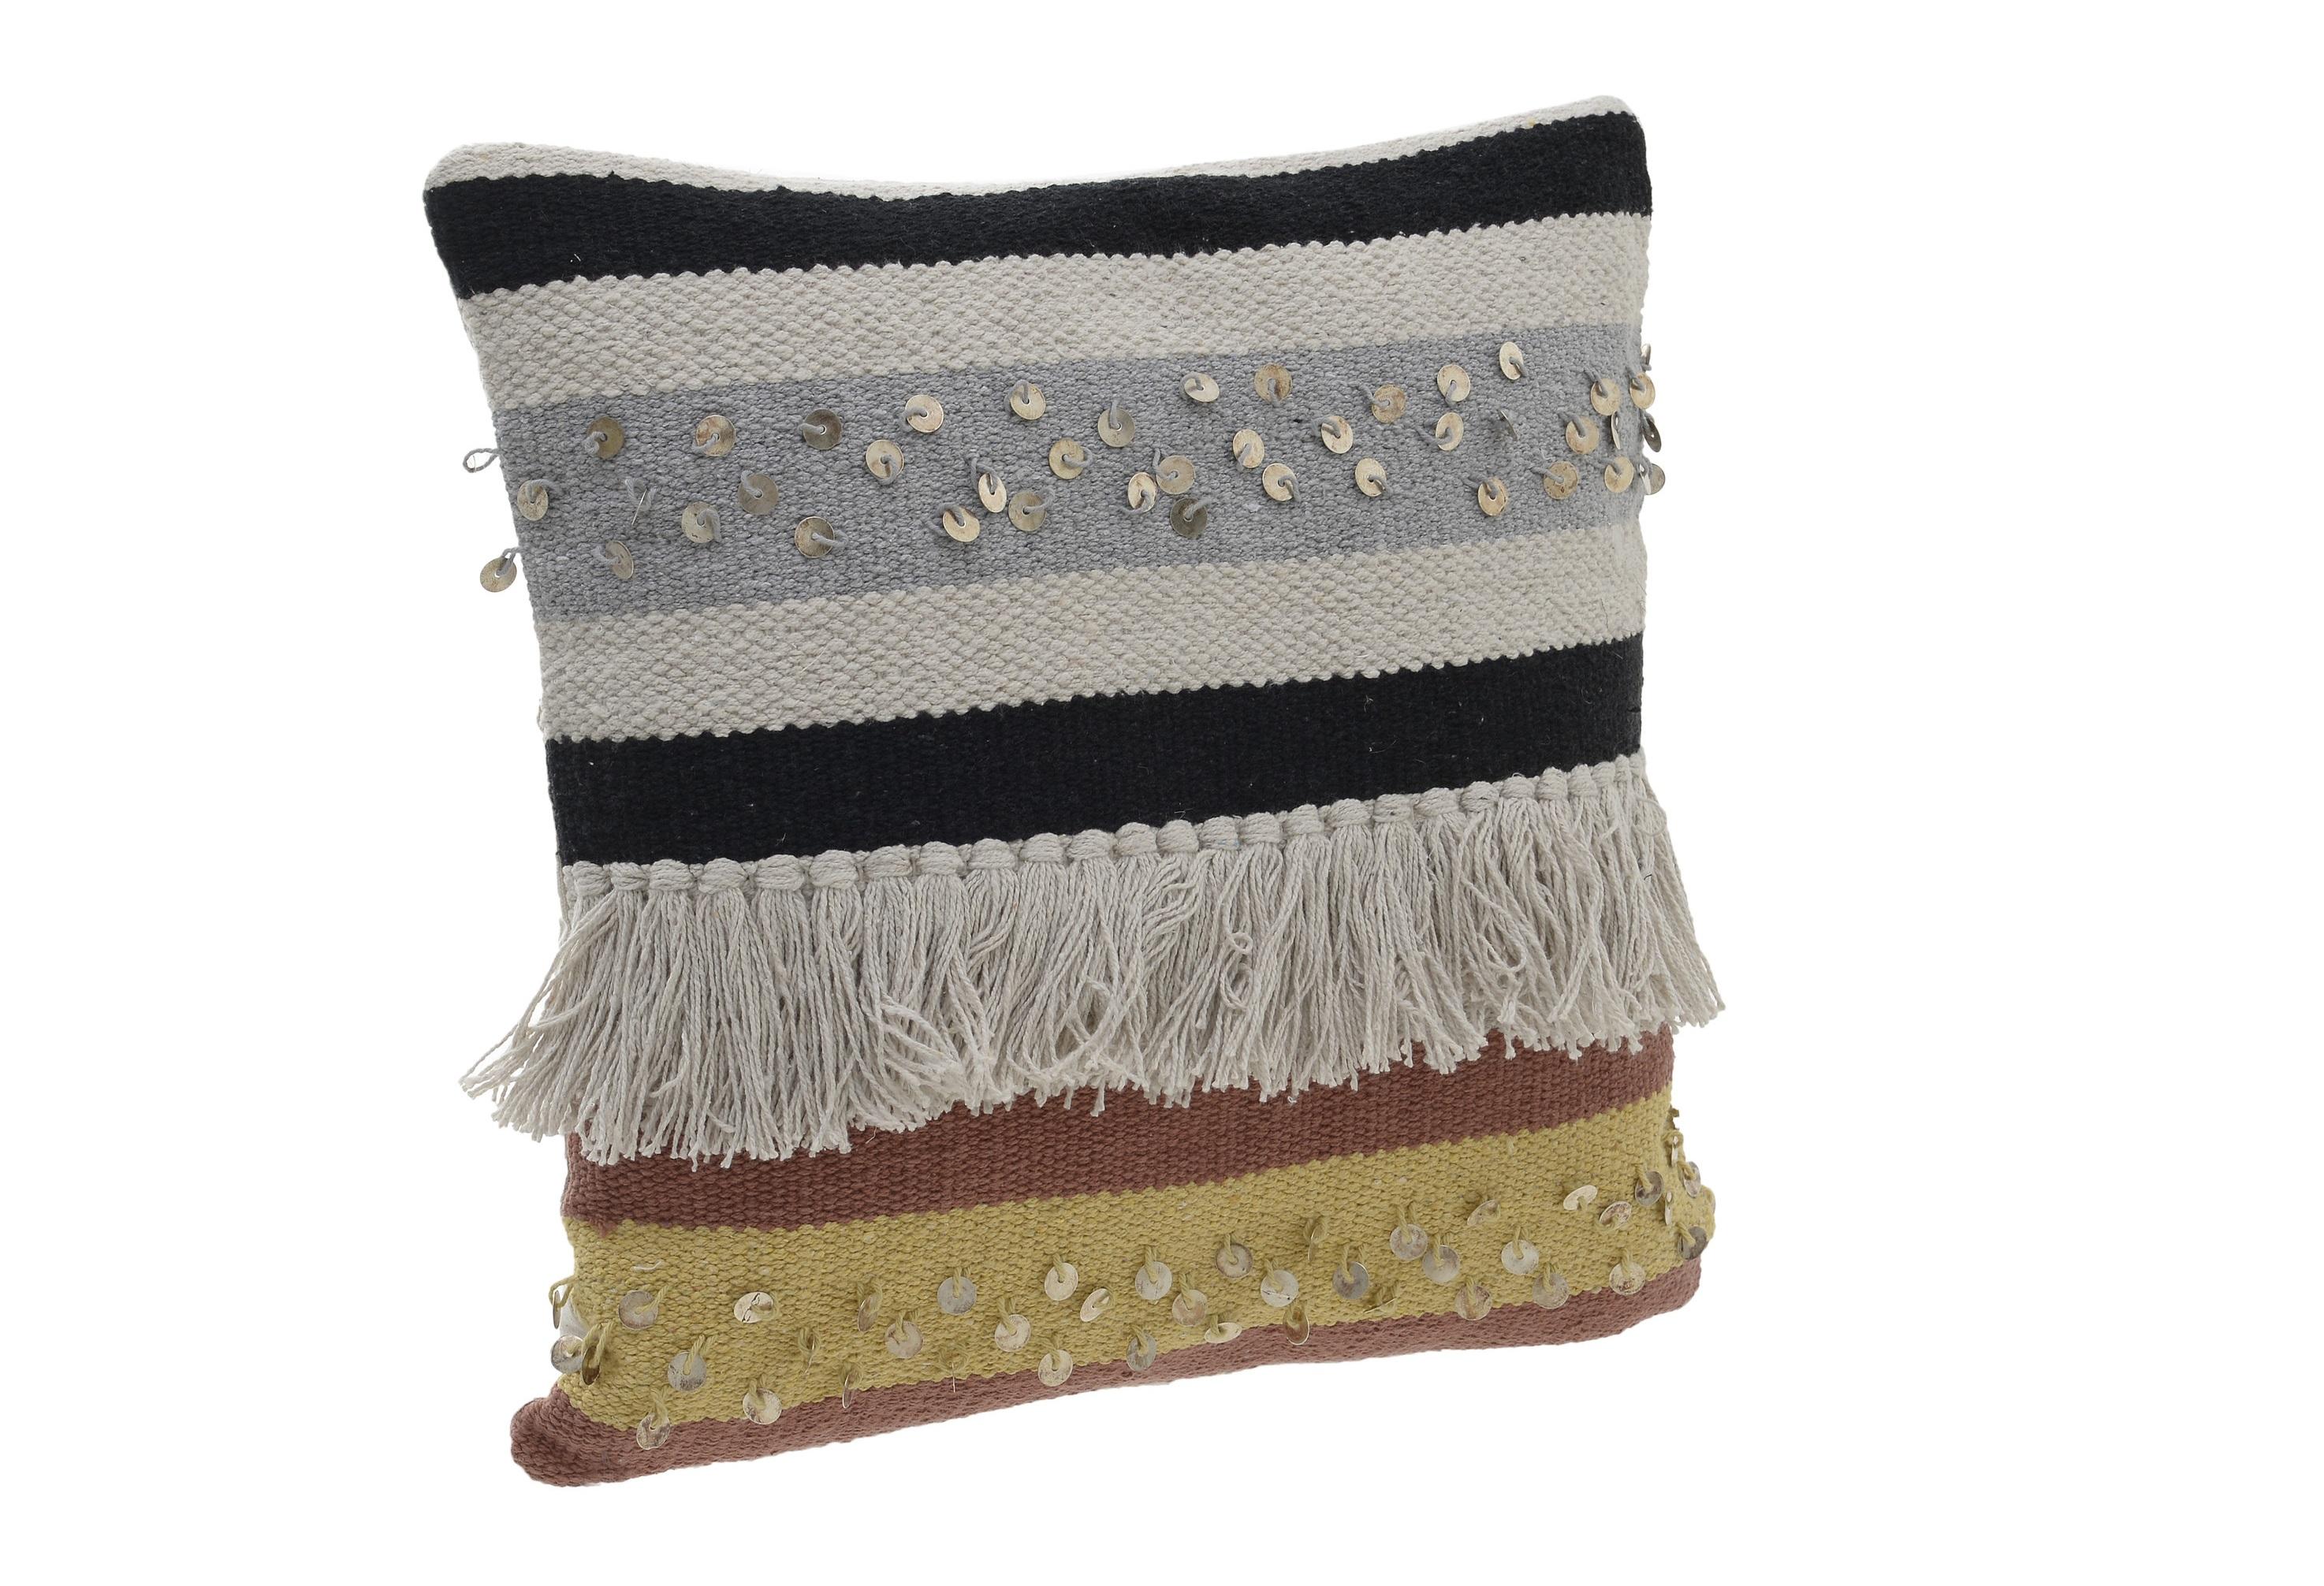 Подушка LynnКвадратные подушки и наволочки<br><br><br>Material: Текстиль<br>Ширина см: 45.0<br>Высота см: 45.0<br>Глубина см: 7.0